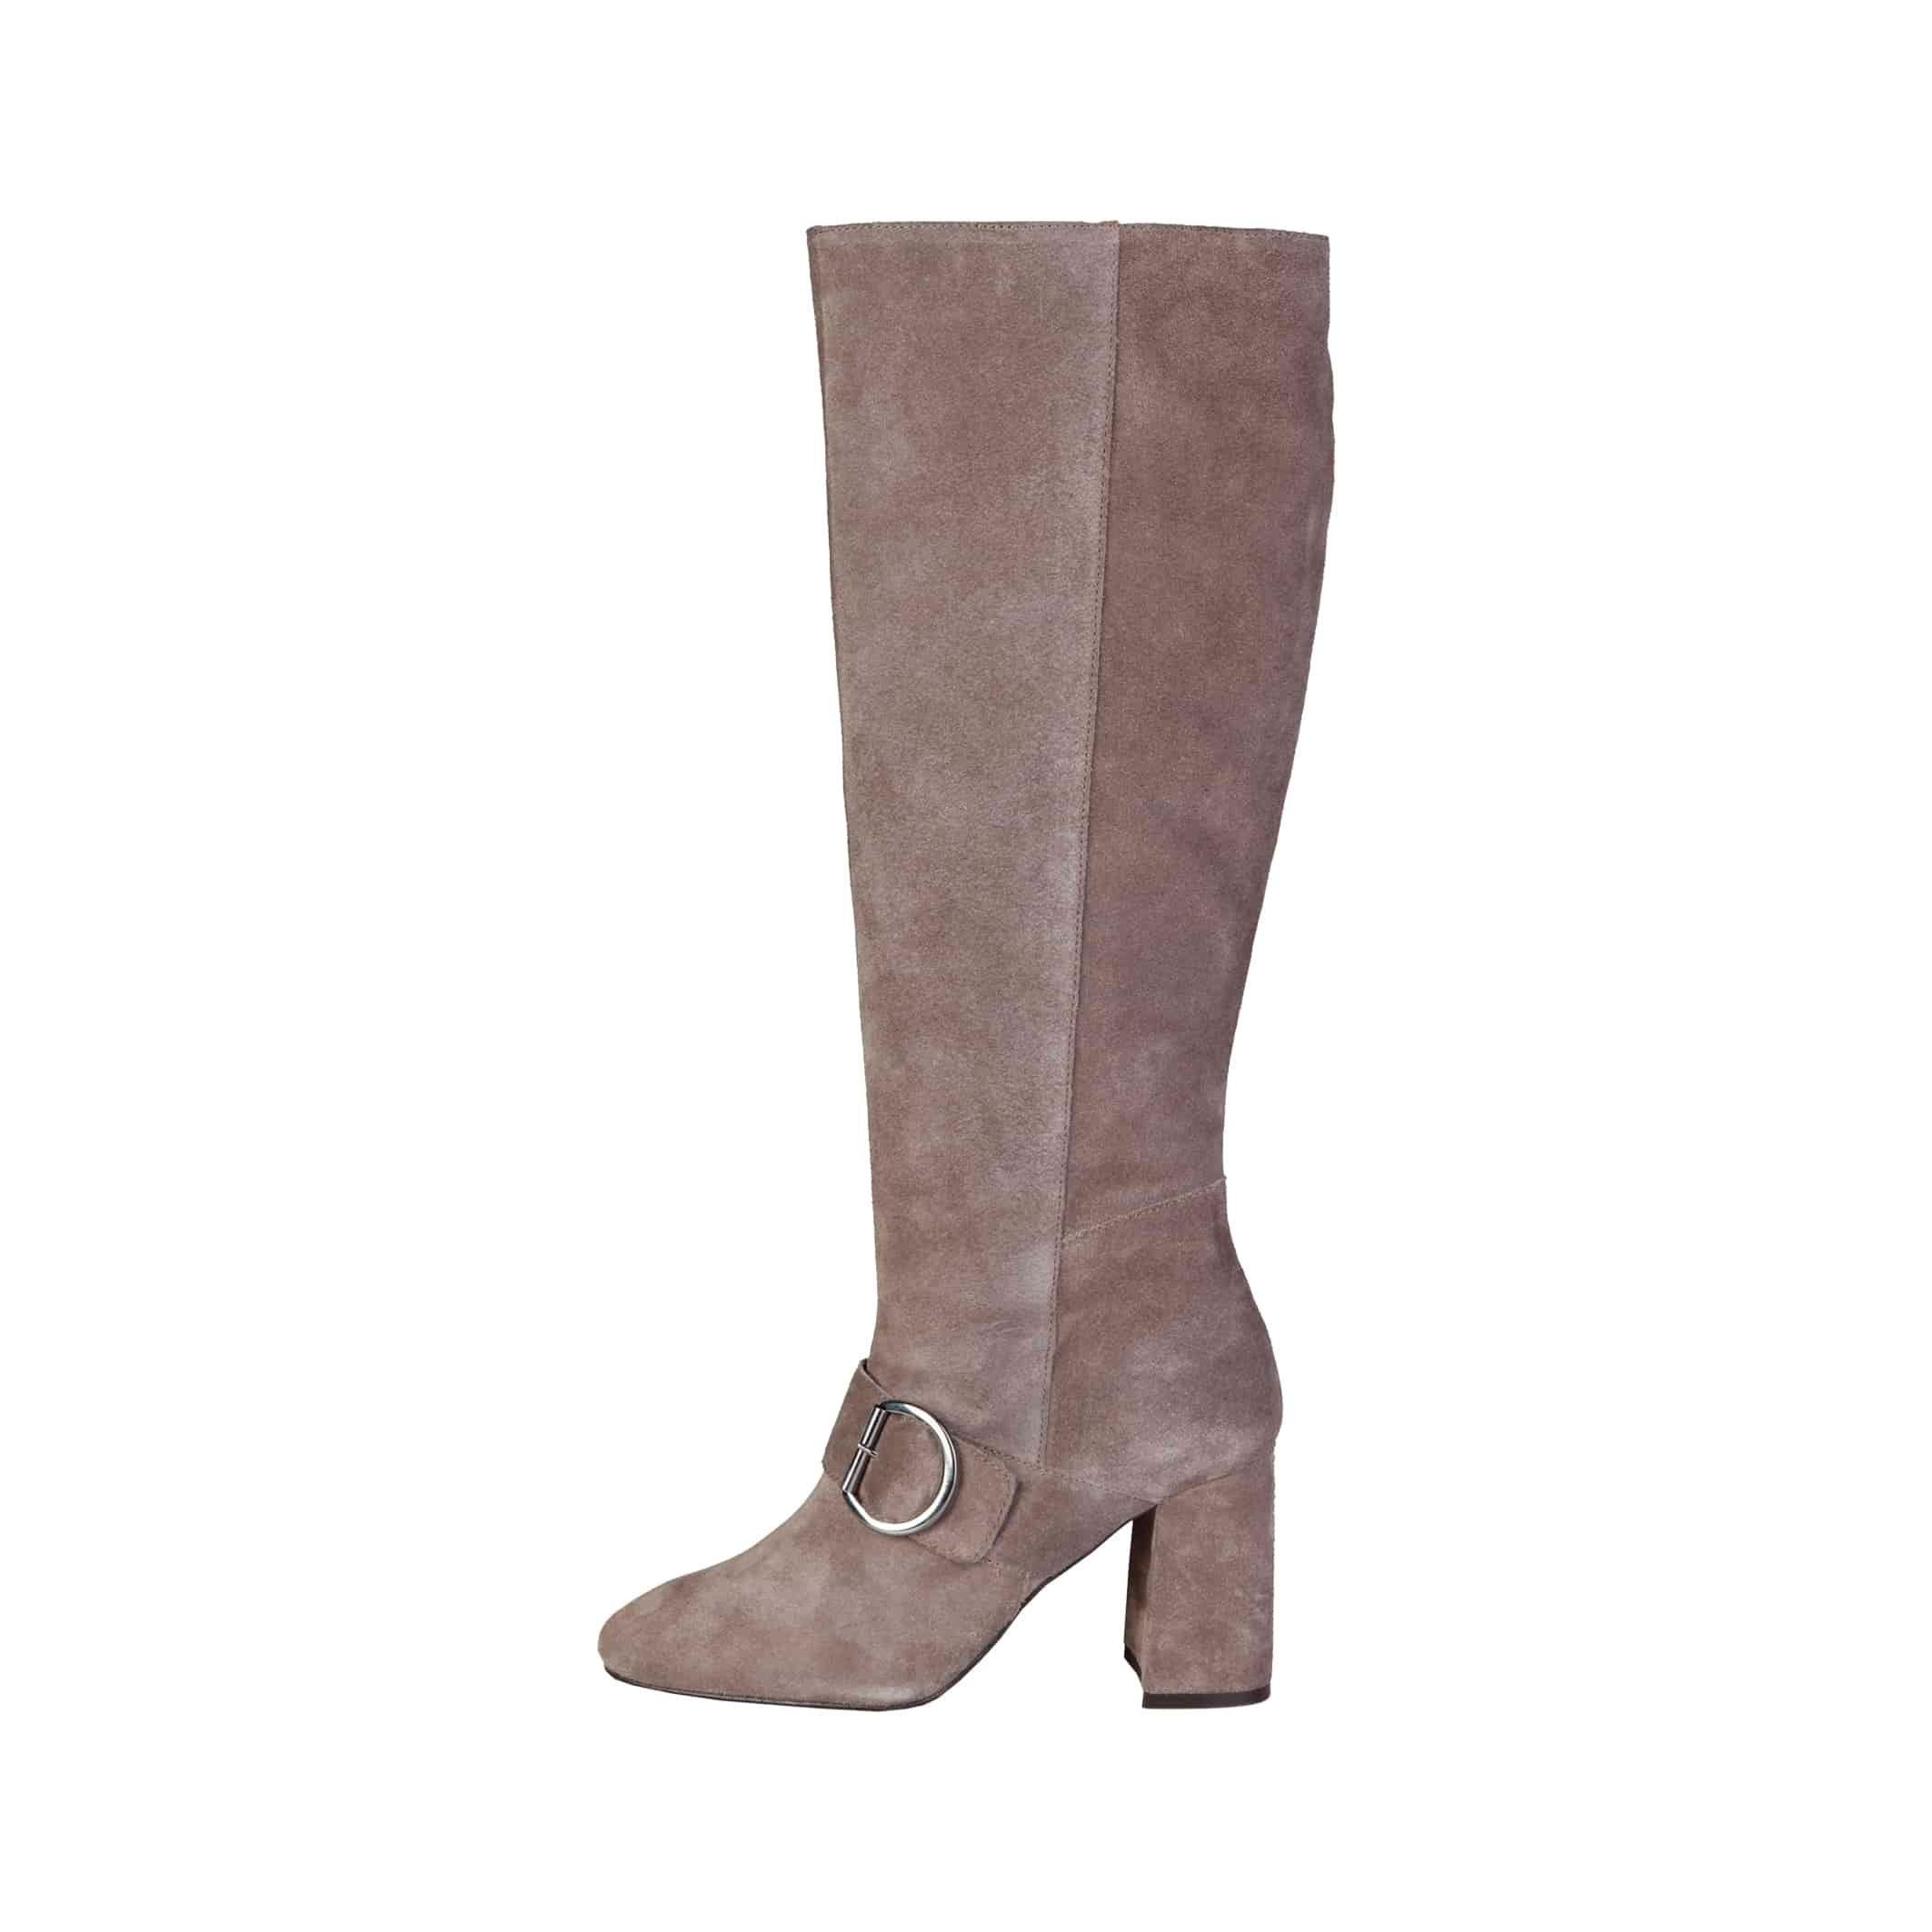 Schuhe Fontana 2.0 – ROMI – Braun